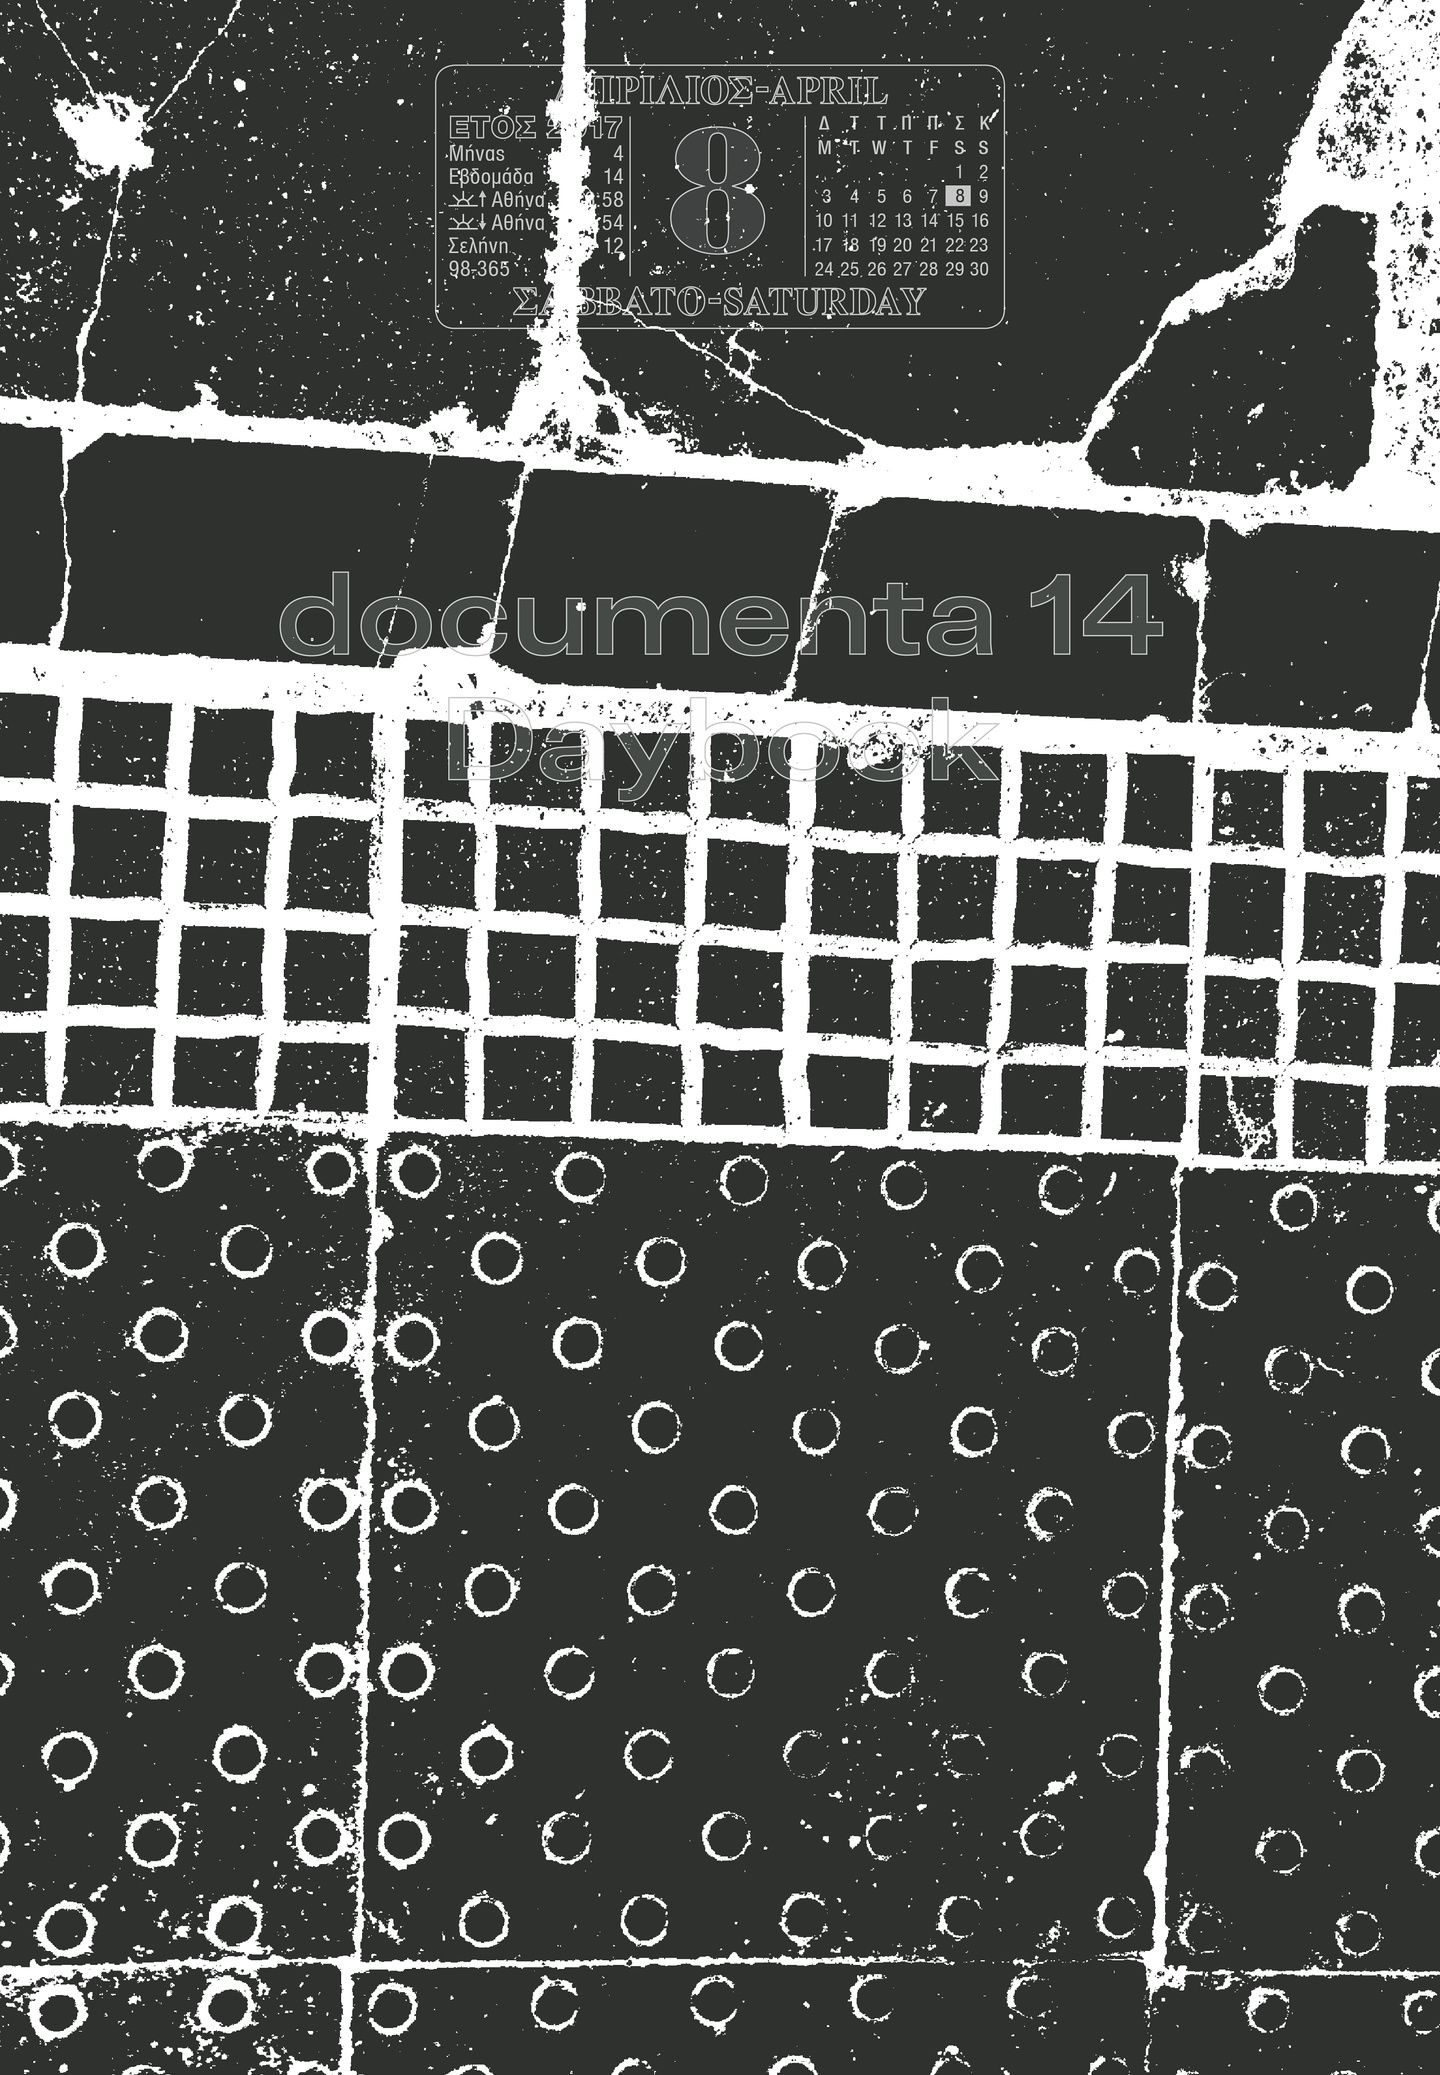 Documenta 14 Daybook Documenta 14 Finefarts Bookbinding  # Muebles Kassel Concepcion